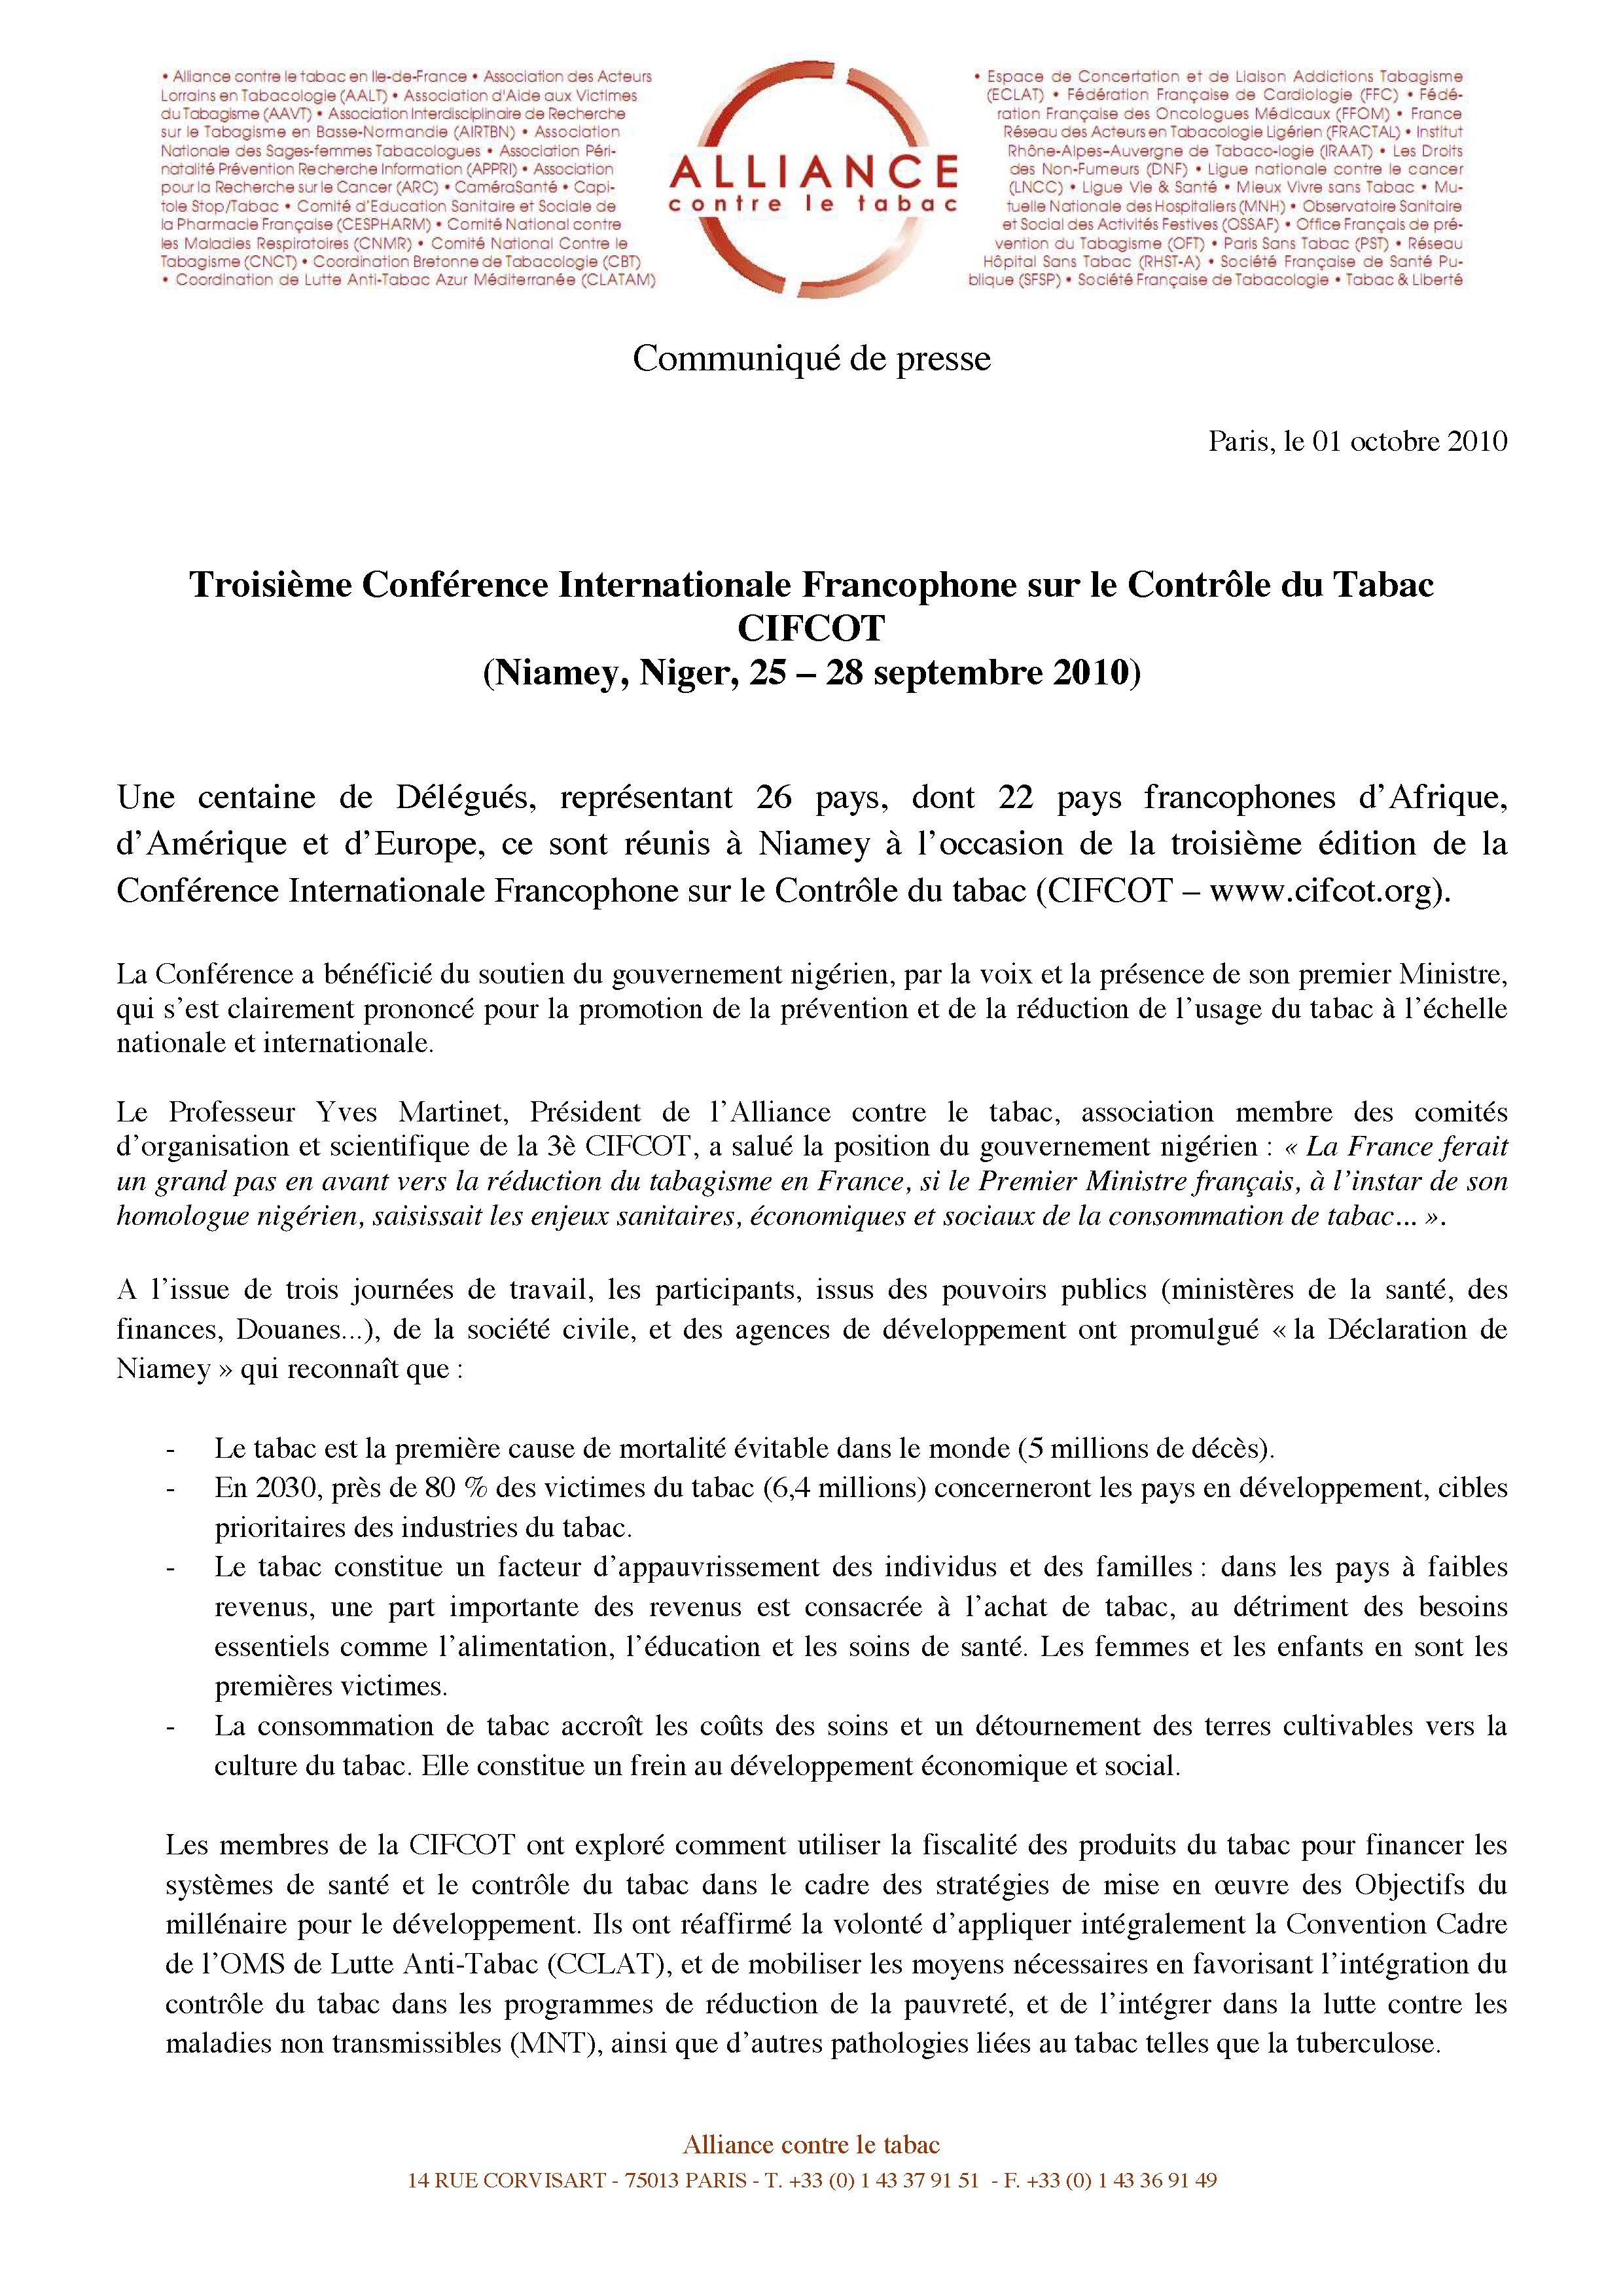 Alliance-CP_cifcot-3-01oct2010_Page_1.jpg